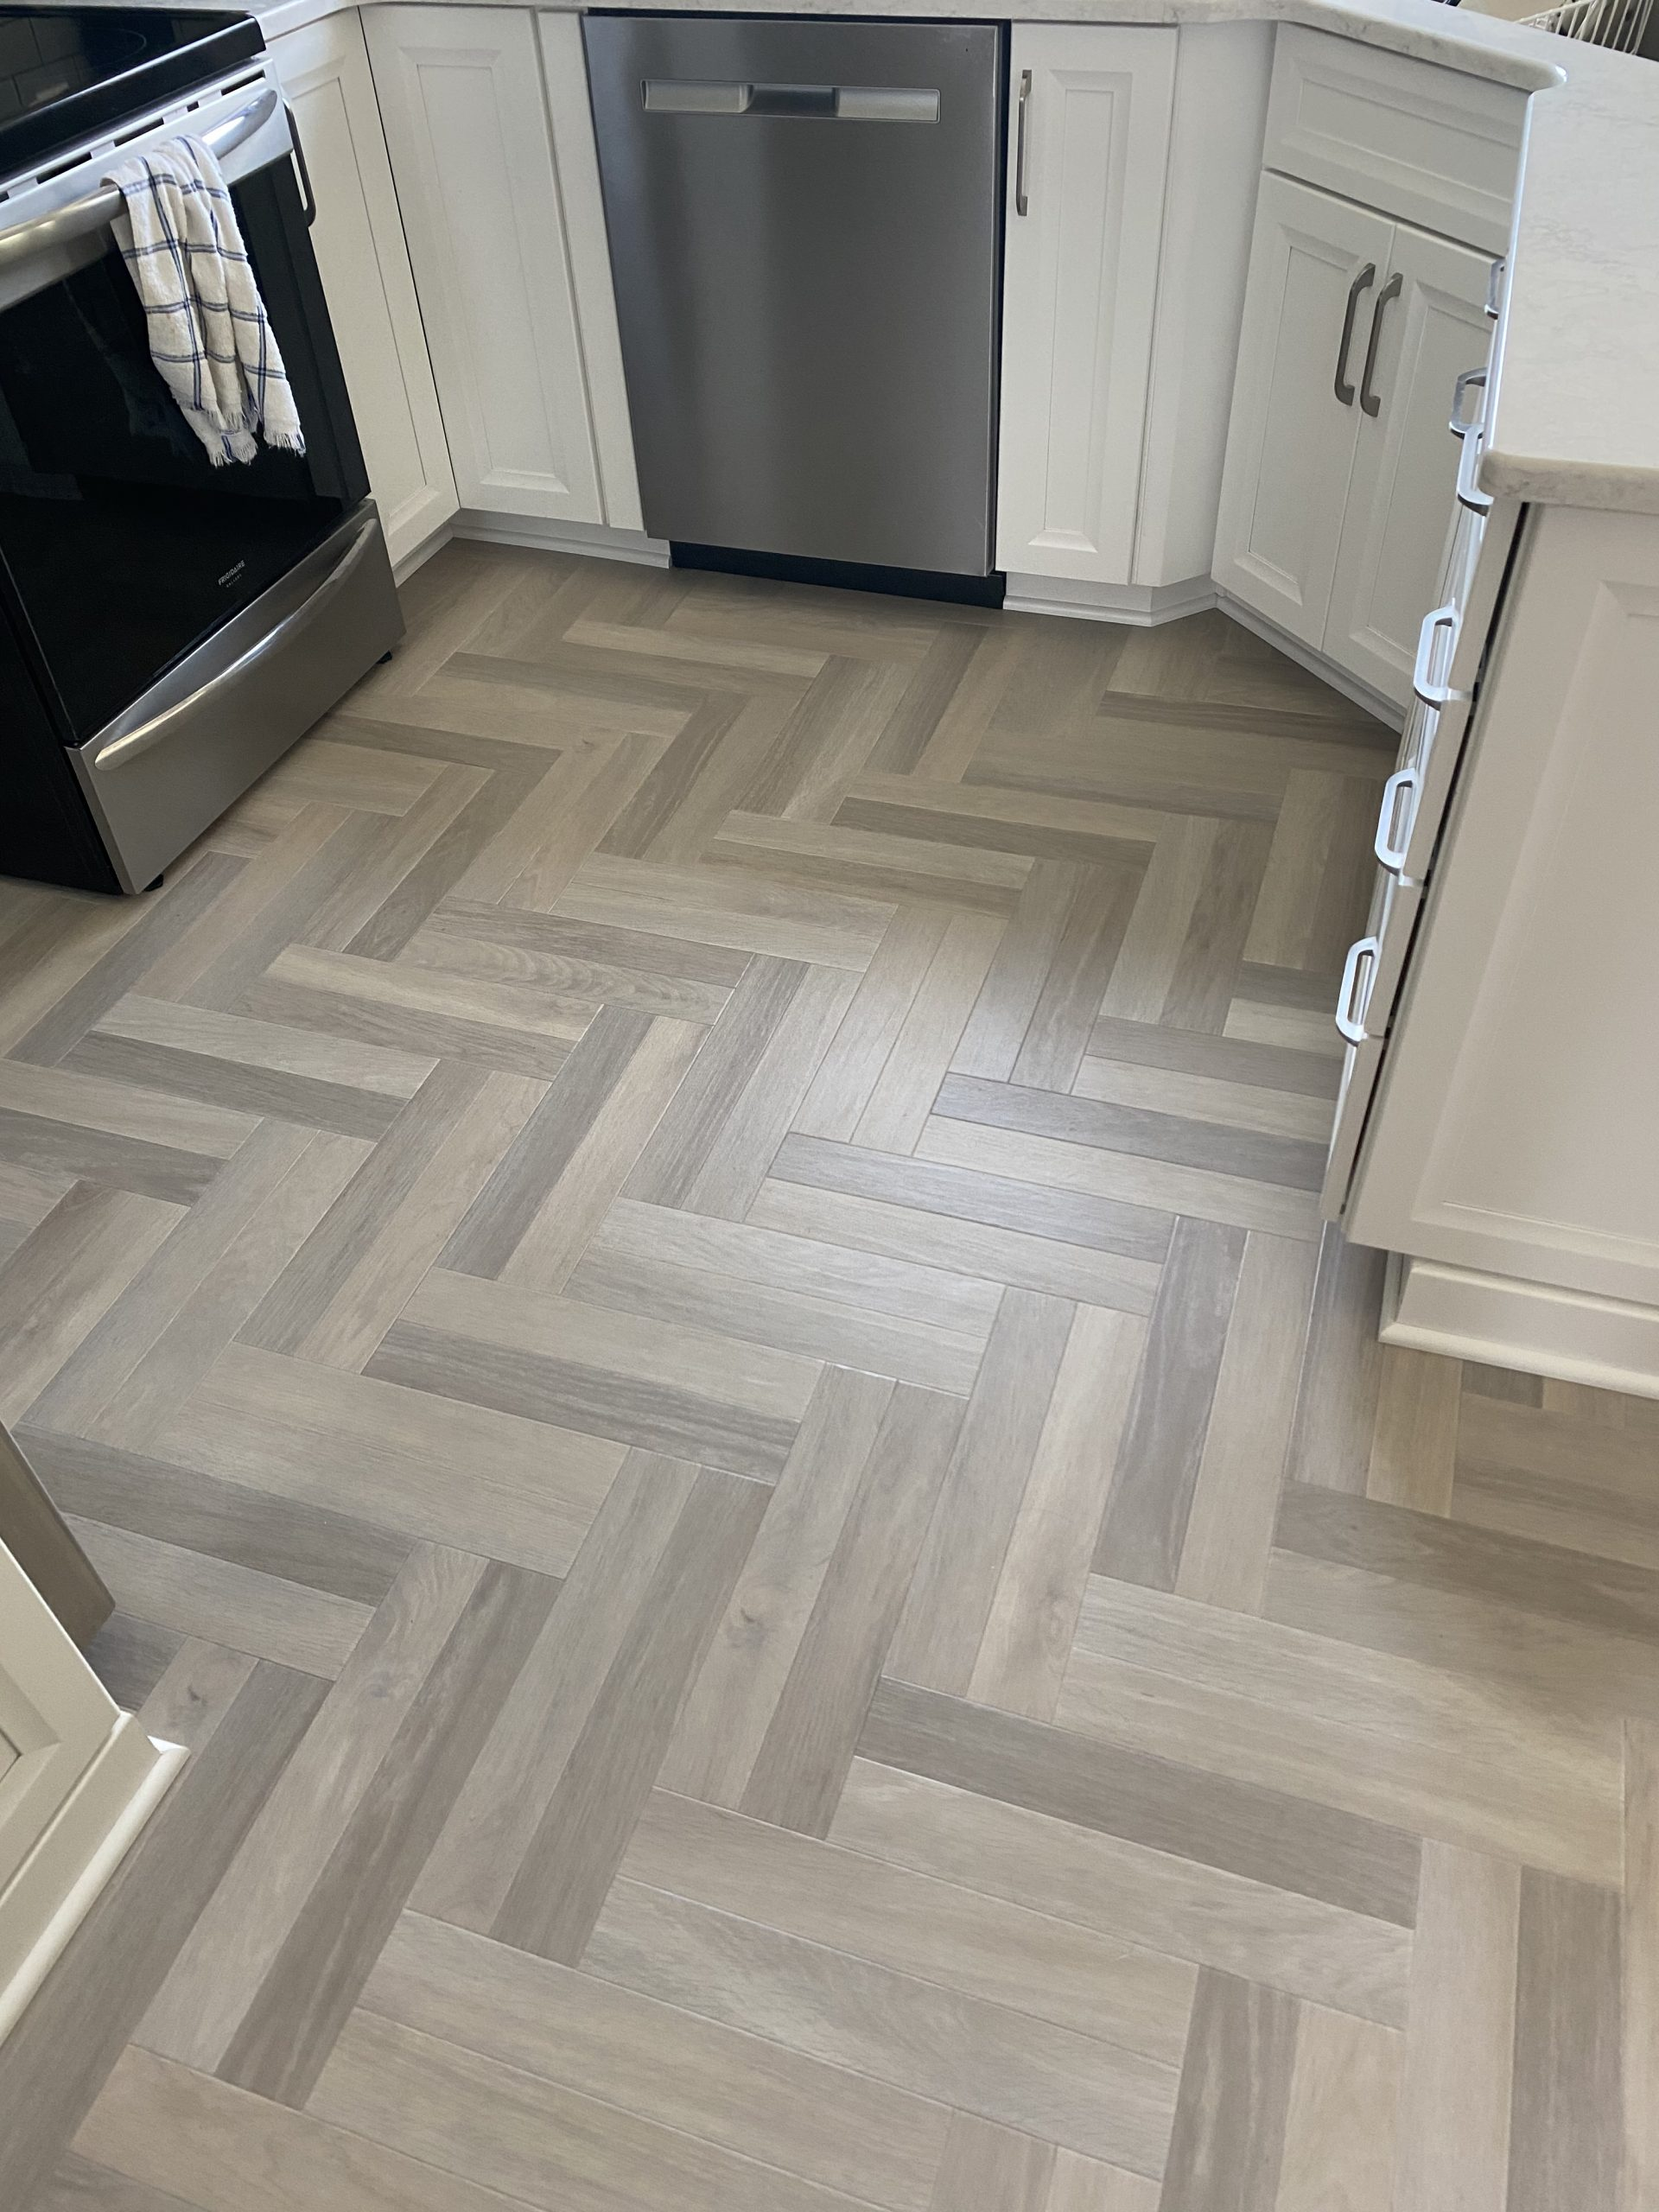 messner-flooring-photos-new-floors-02-1-